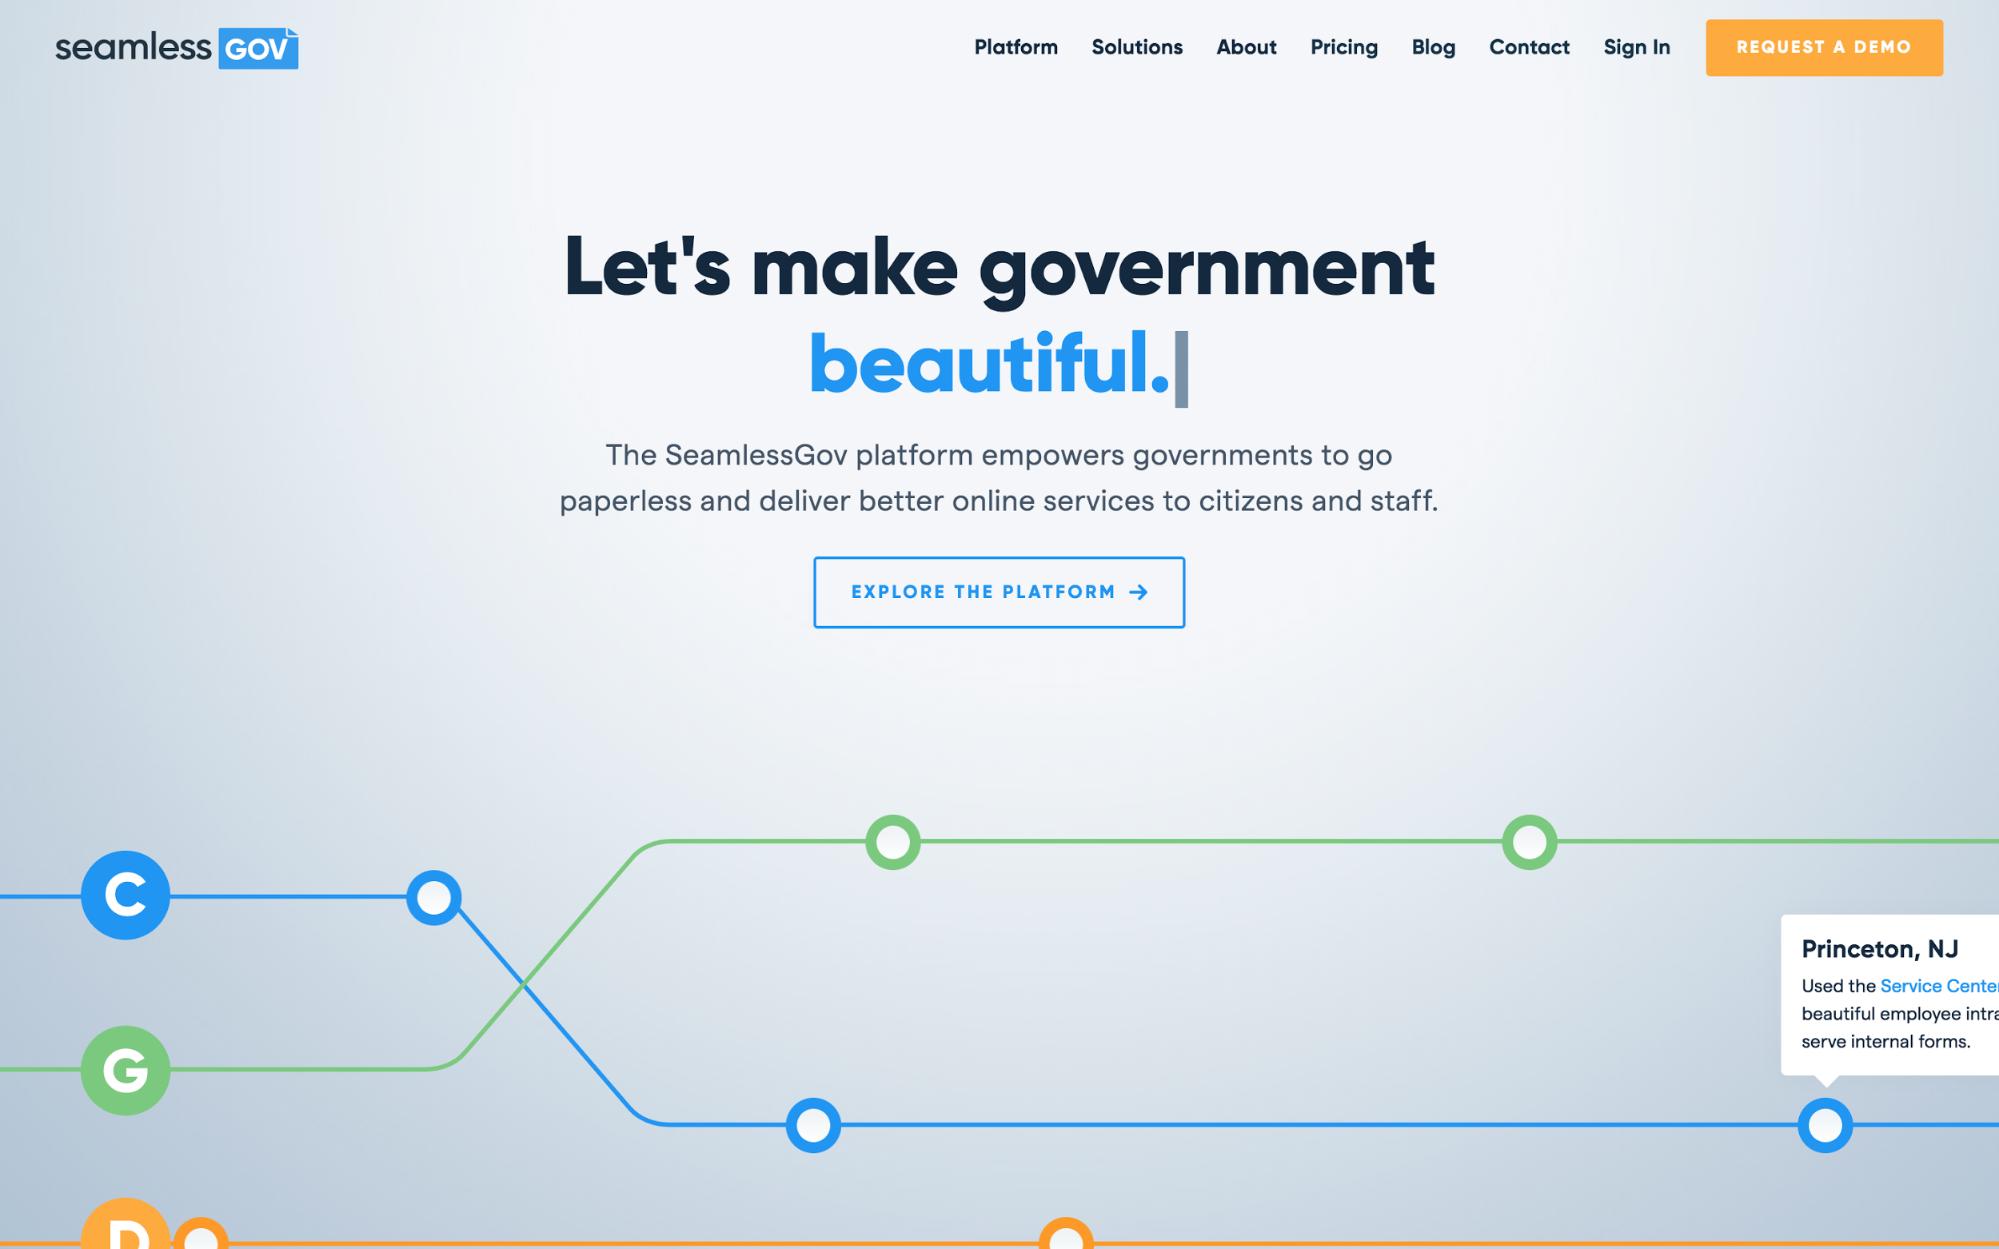 SeamlessGov's homepage